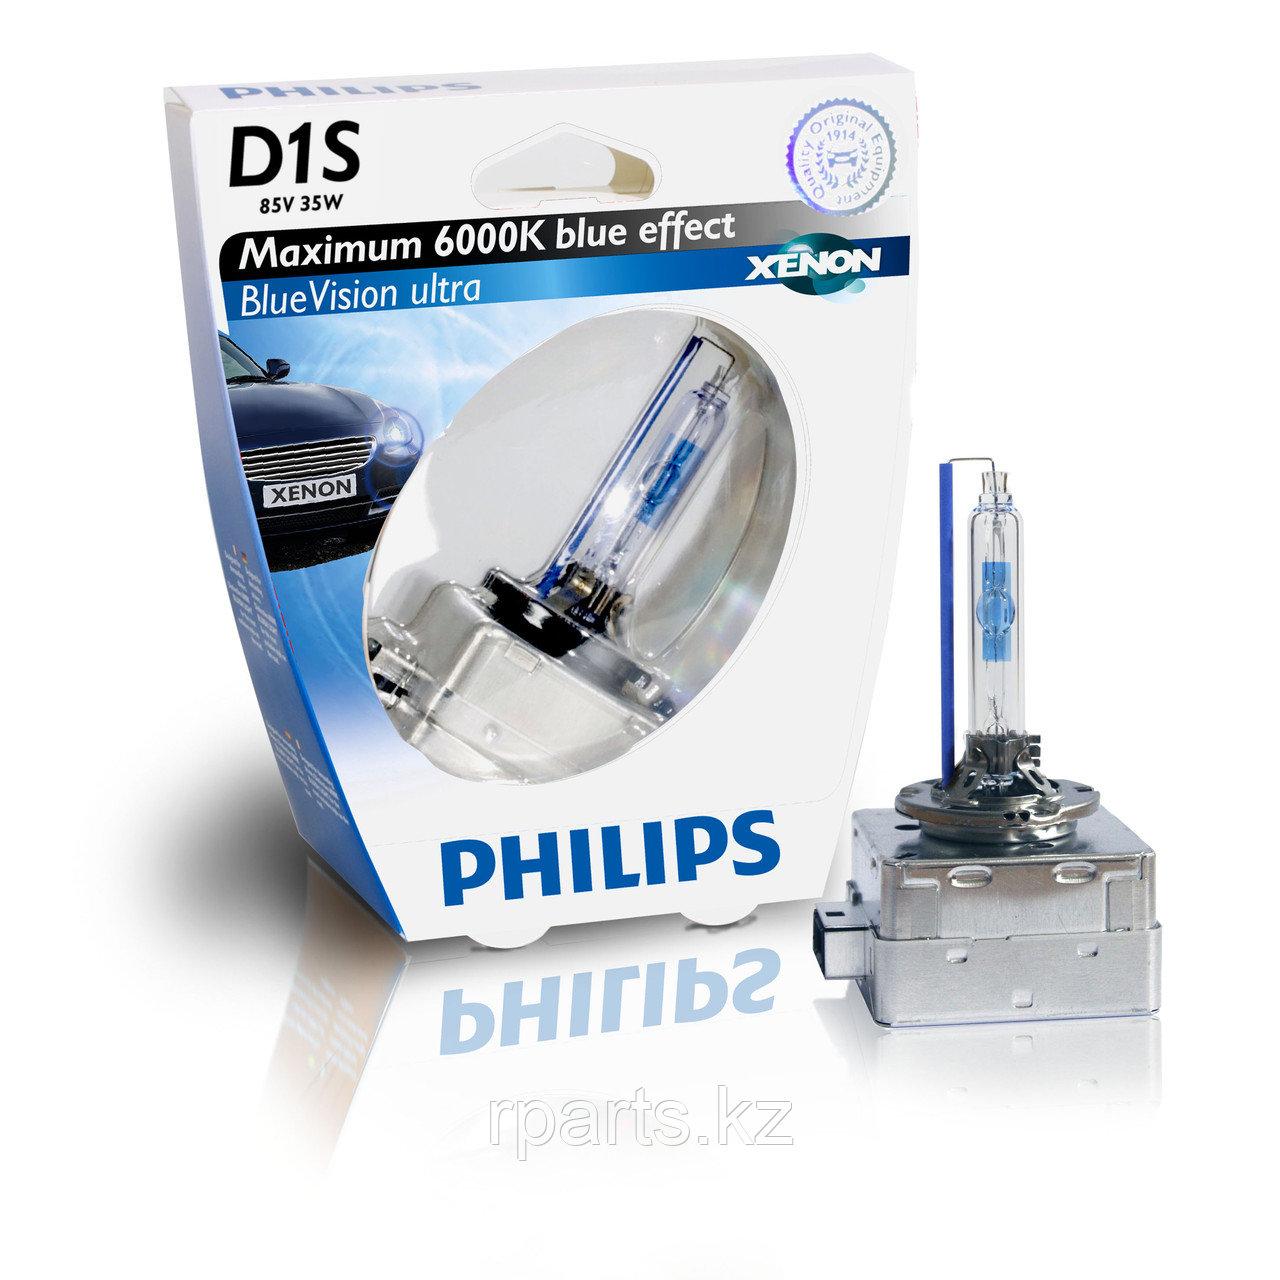 Ксеноновая лампа Philips  Xenon BlueVision Ultra D1S